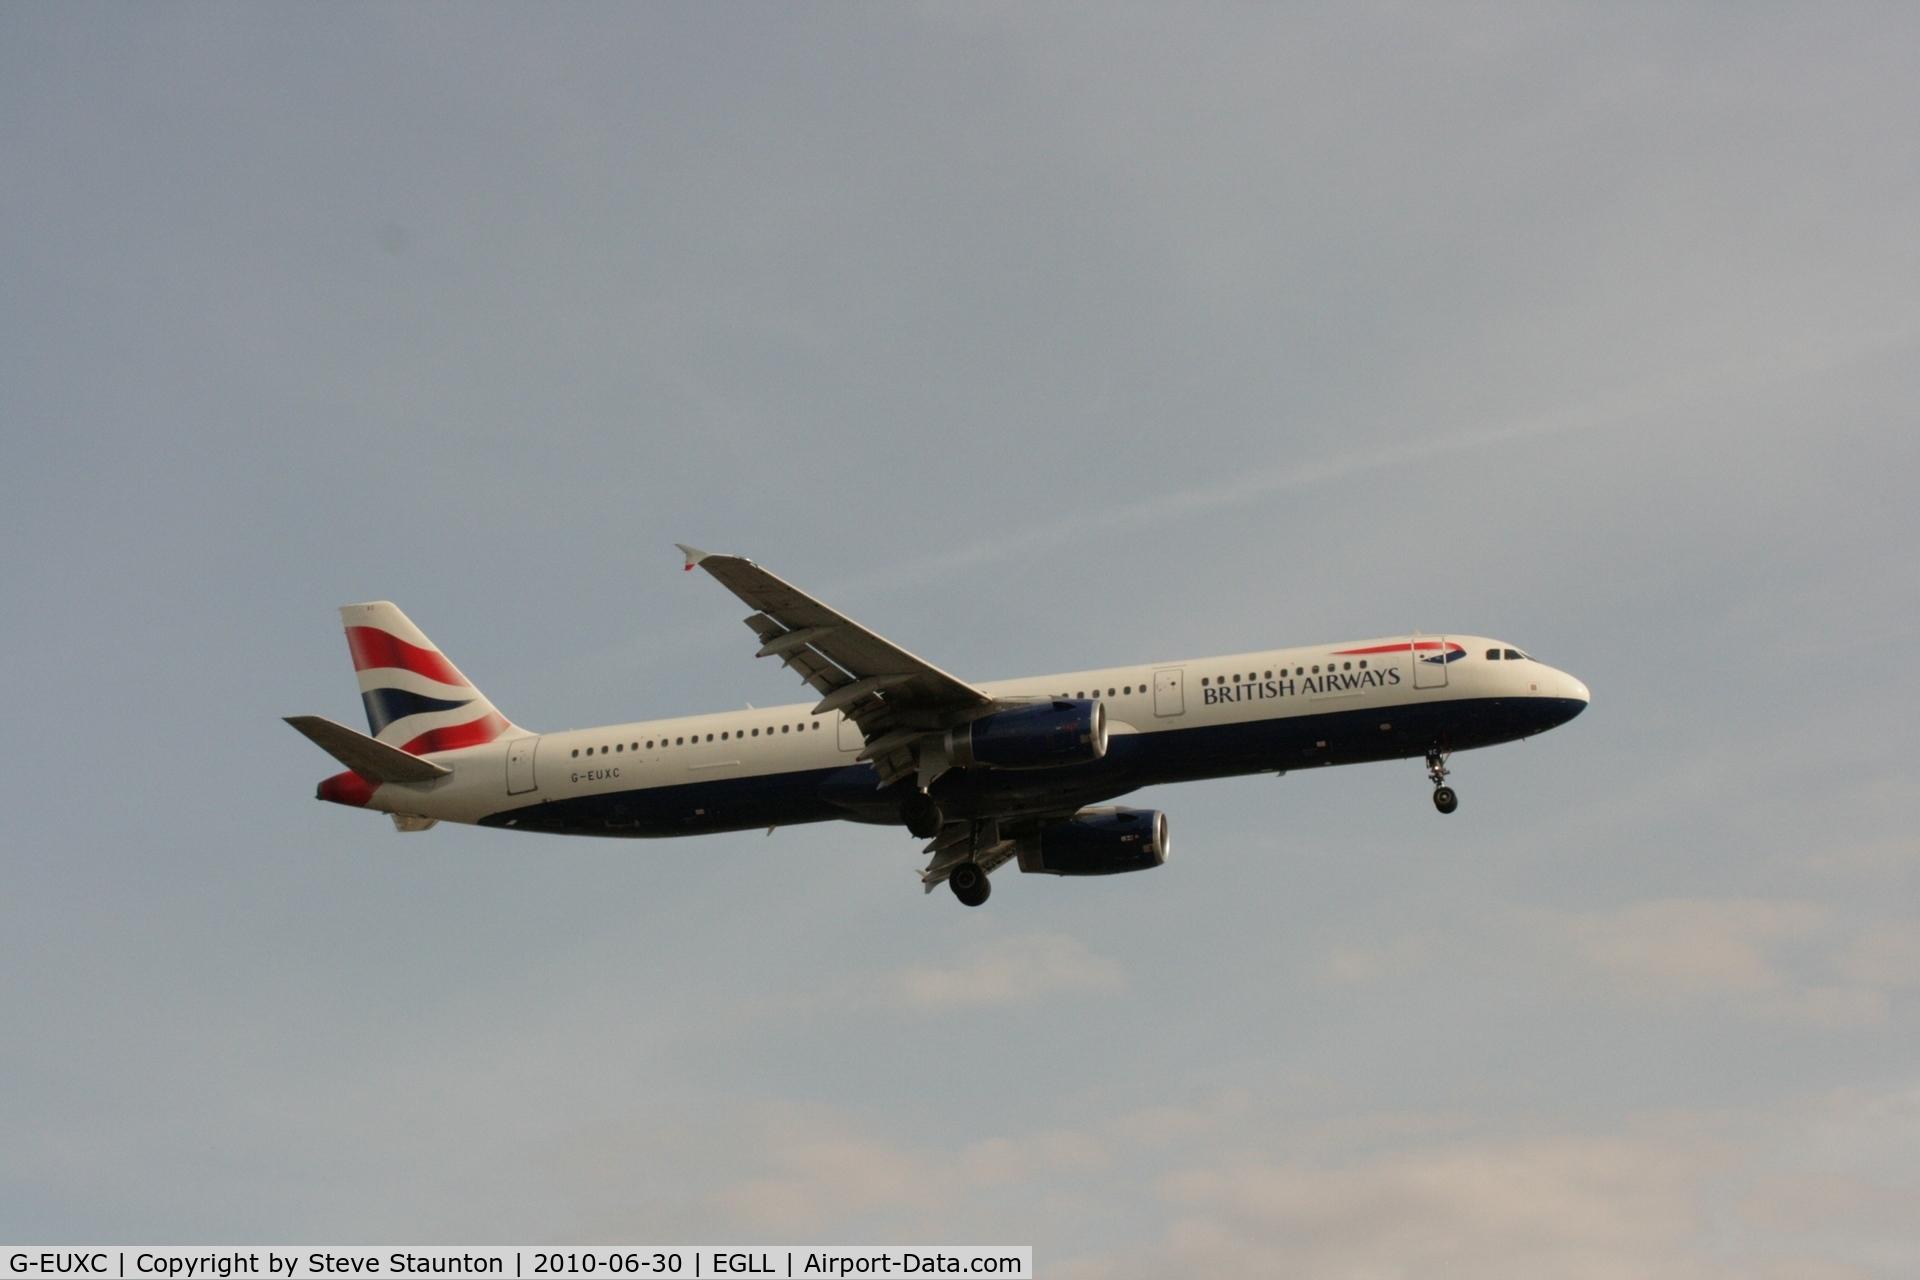 G-EUXC, 2004 Airbus A321-231 C/N 2305, Taken at Heathrow Airport, June 2010